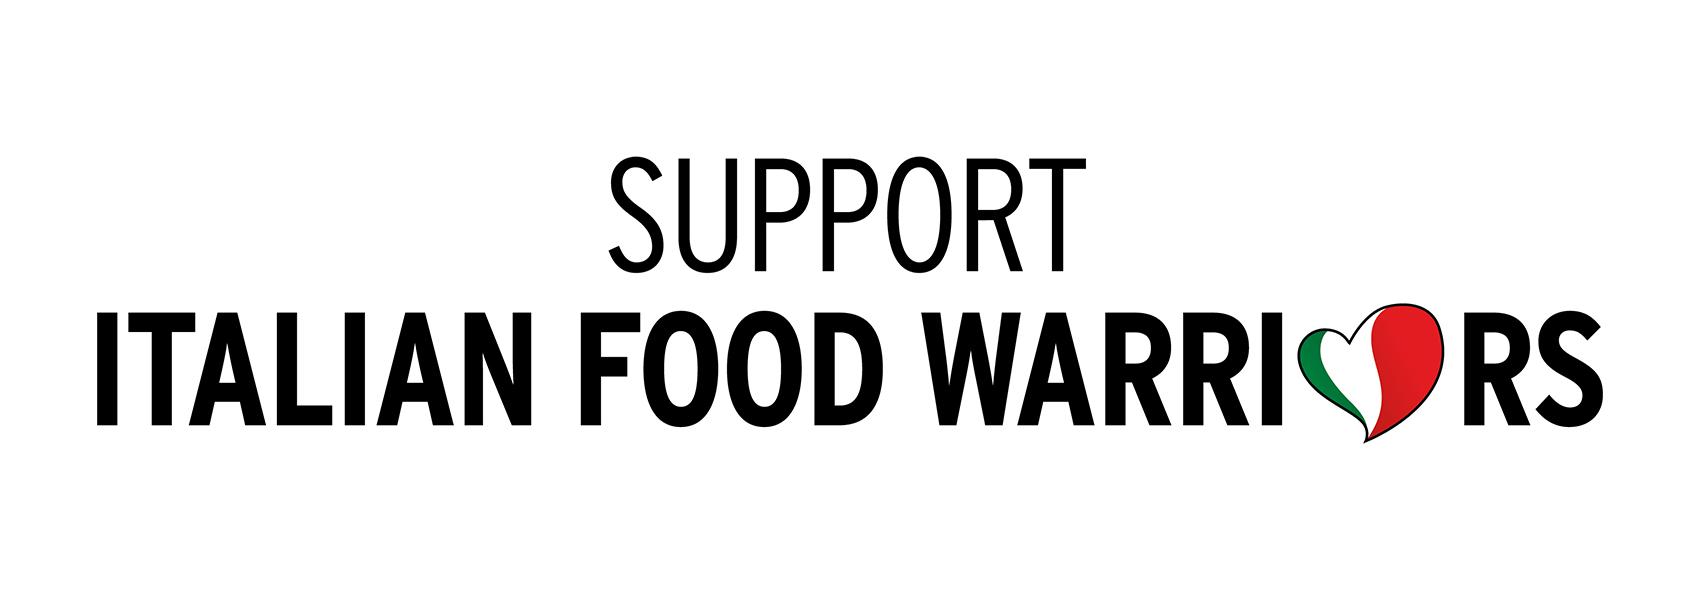 SUPPORT ITALIAN FOOD WARRIORS